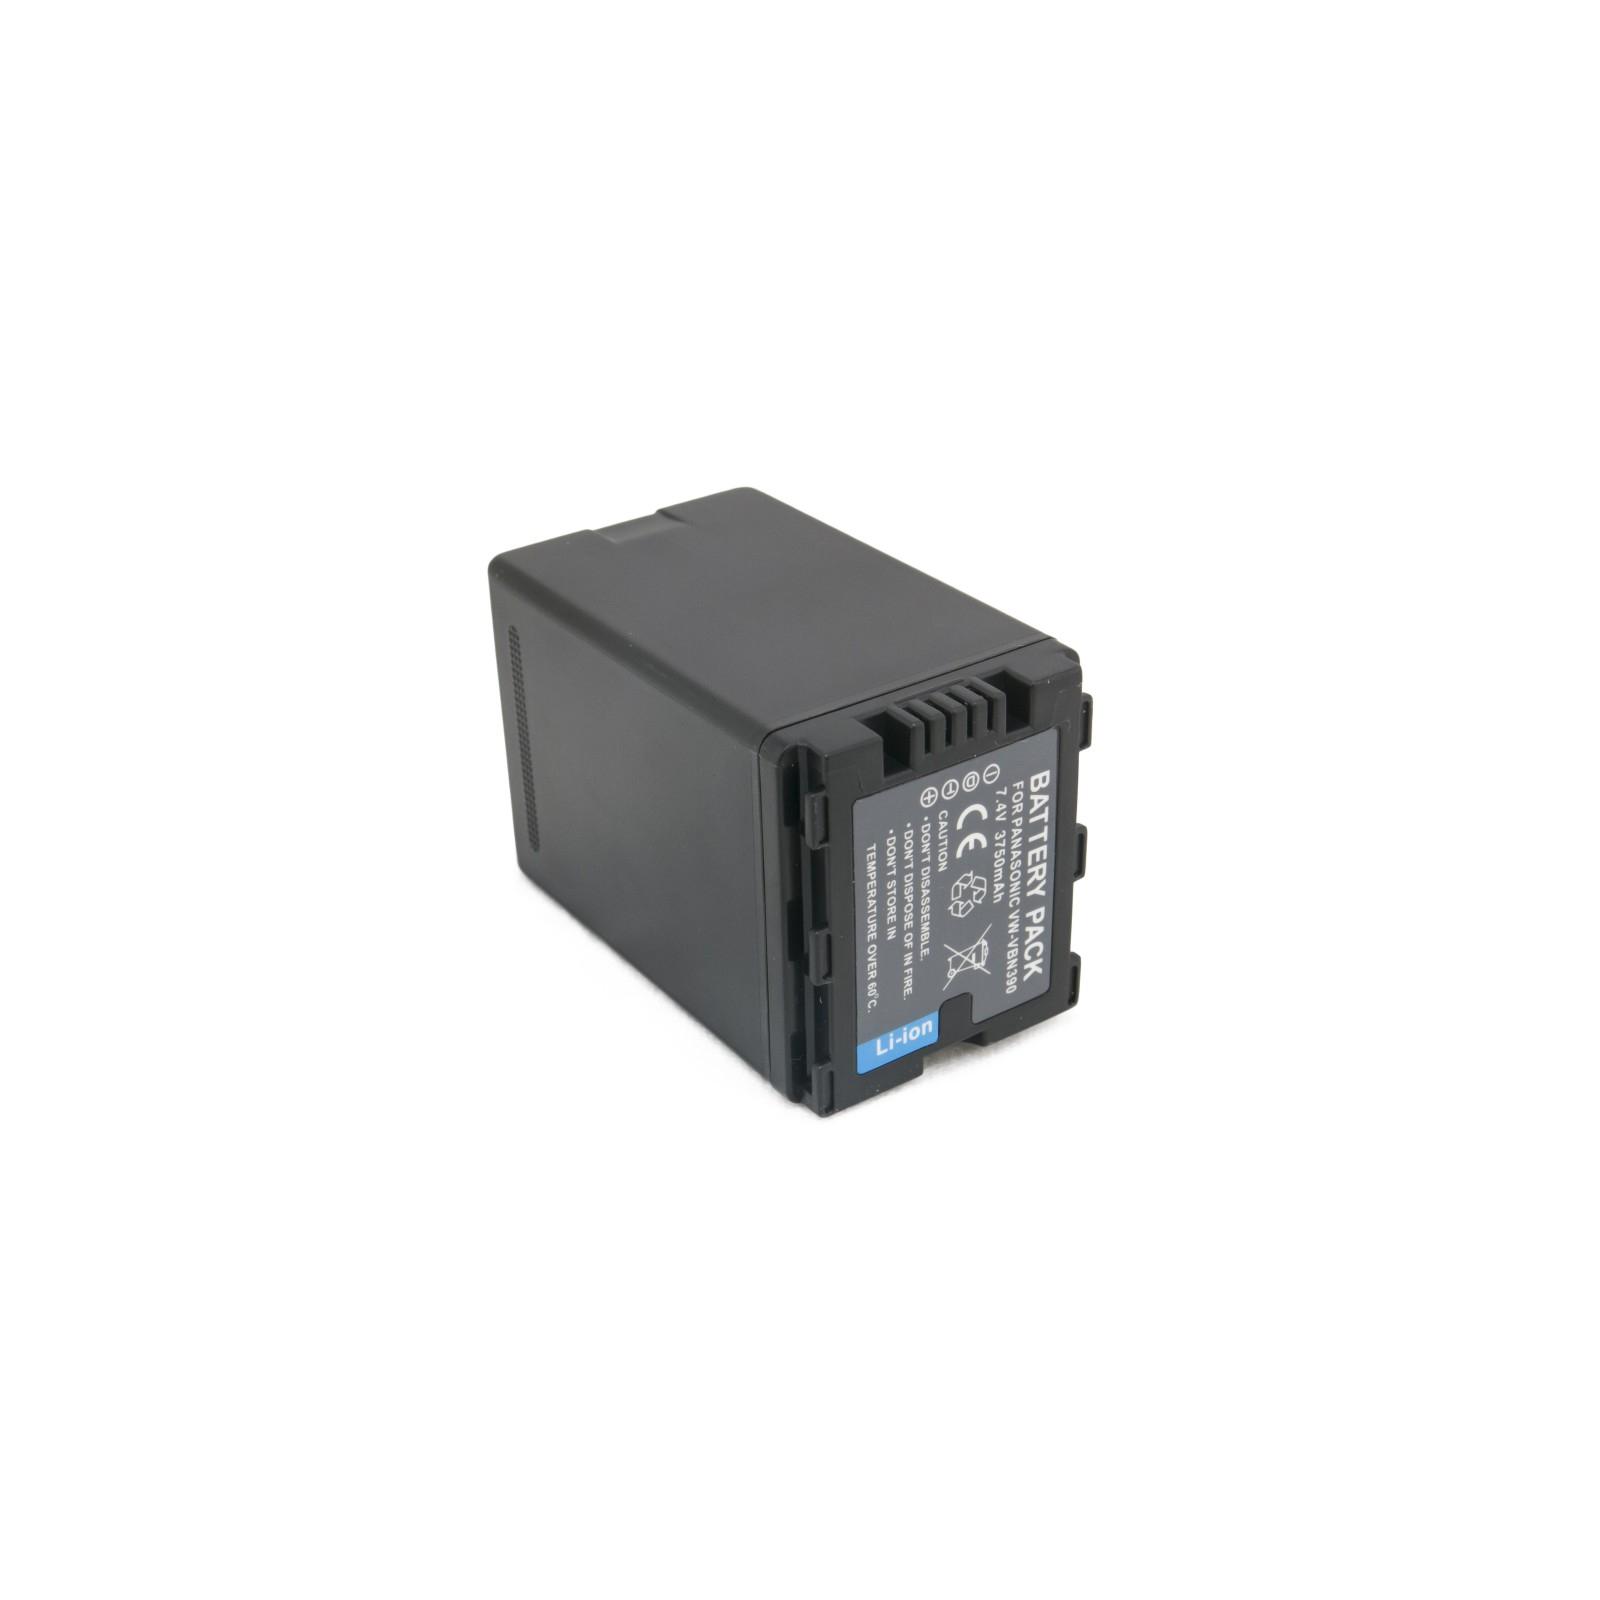 Аккумулятор к фото/видео EXTRADIGITAL Panasonic VW-VBN390 (DV00DV1365) изображение 6